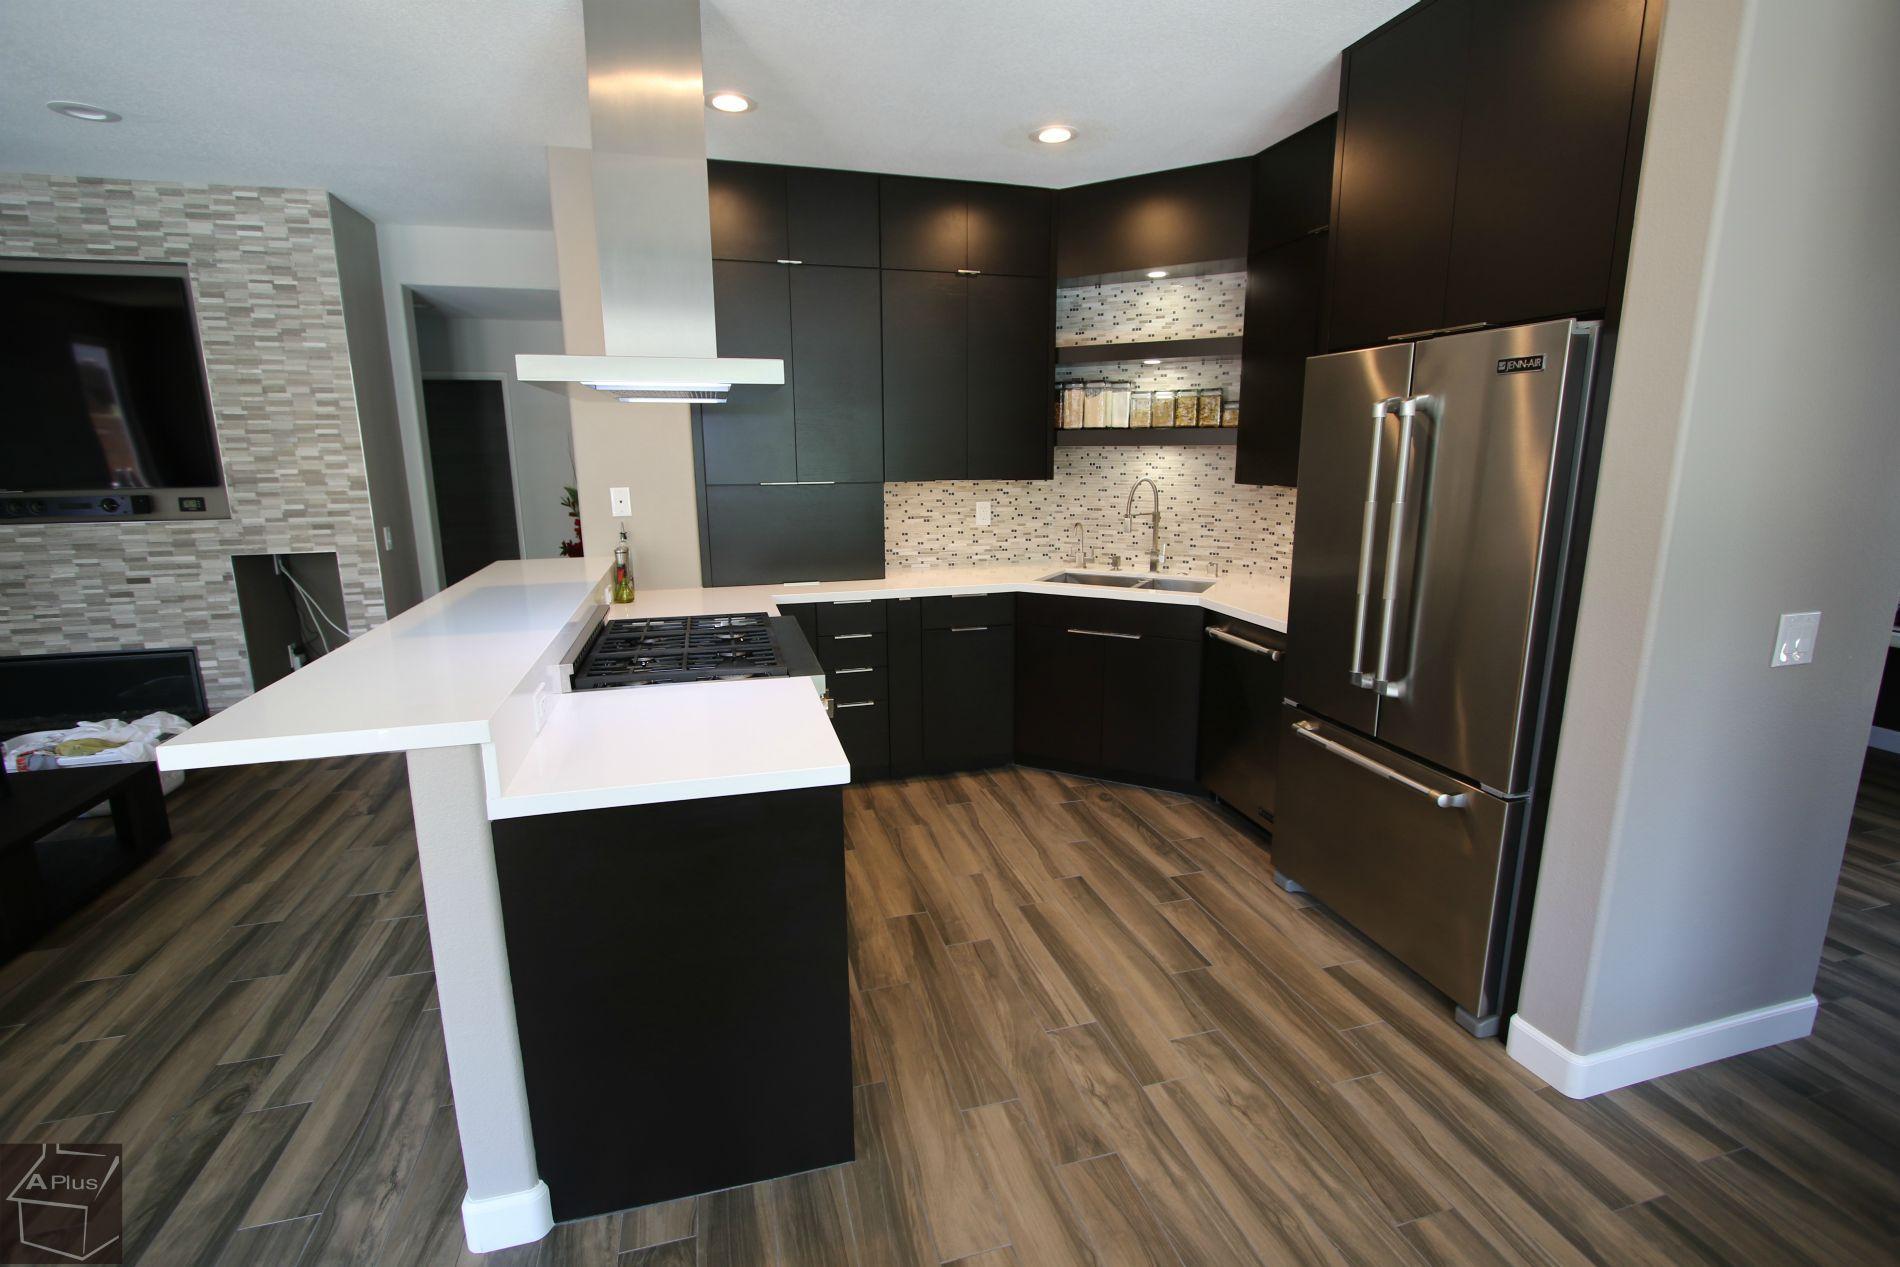 Design Build Modern Kitchen Remodel with APlus Sophia Line ...